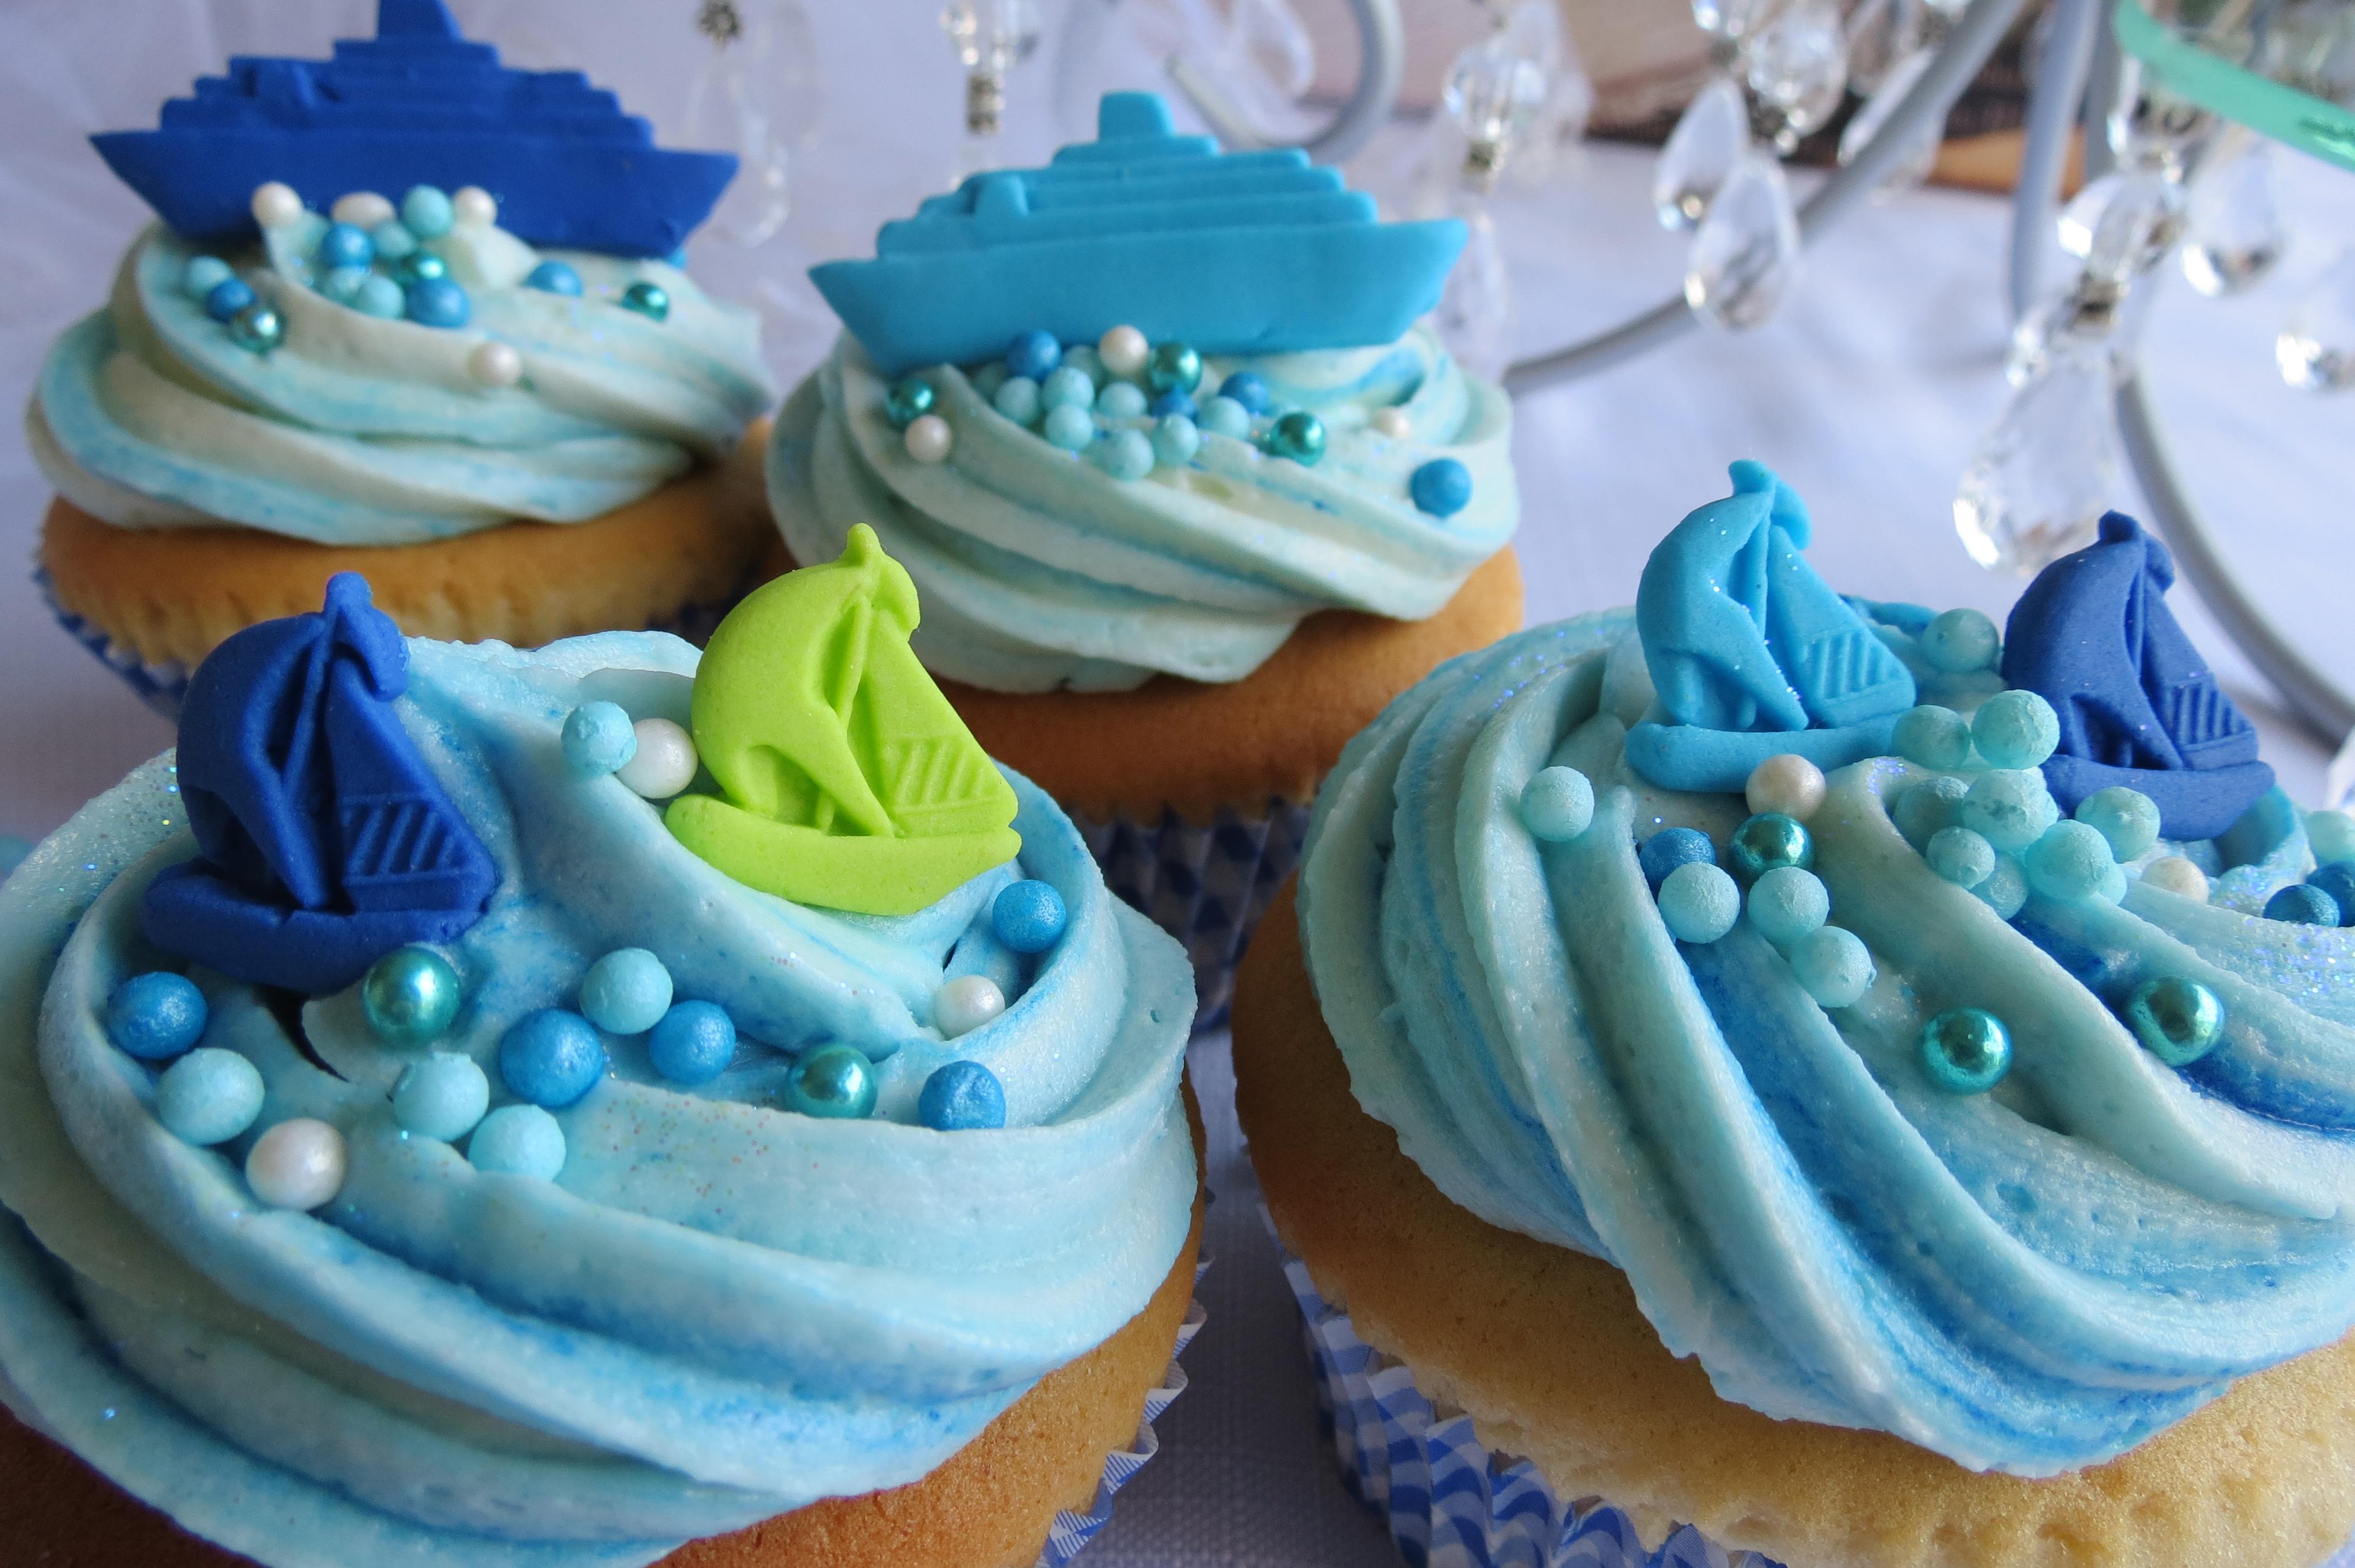 Cupcakes For Boys Cupcakes2delite